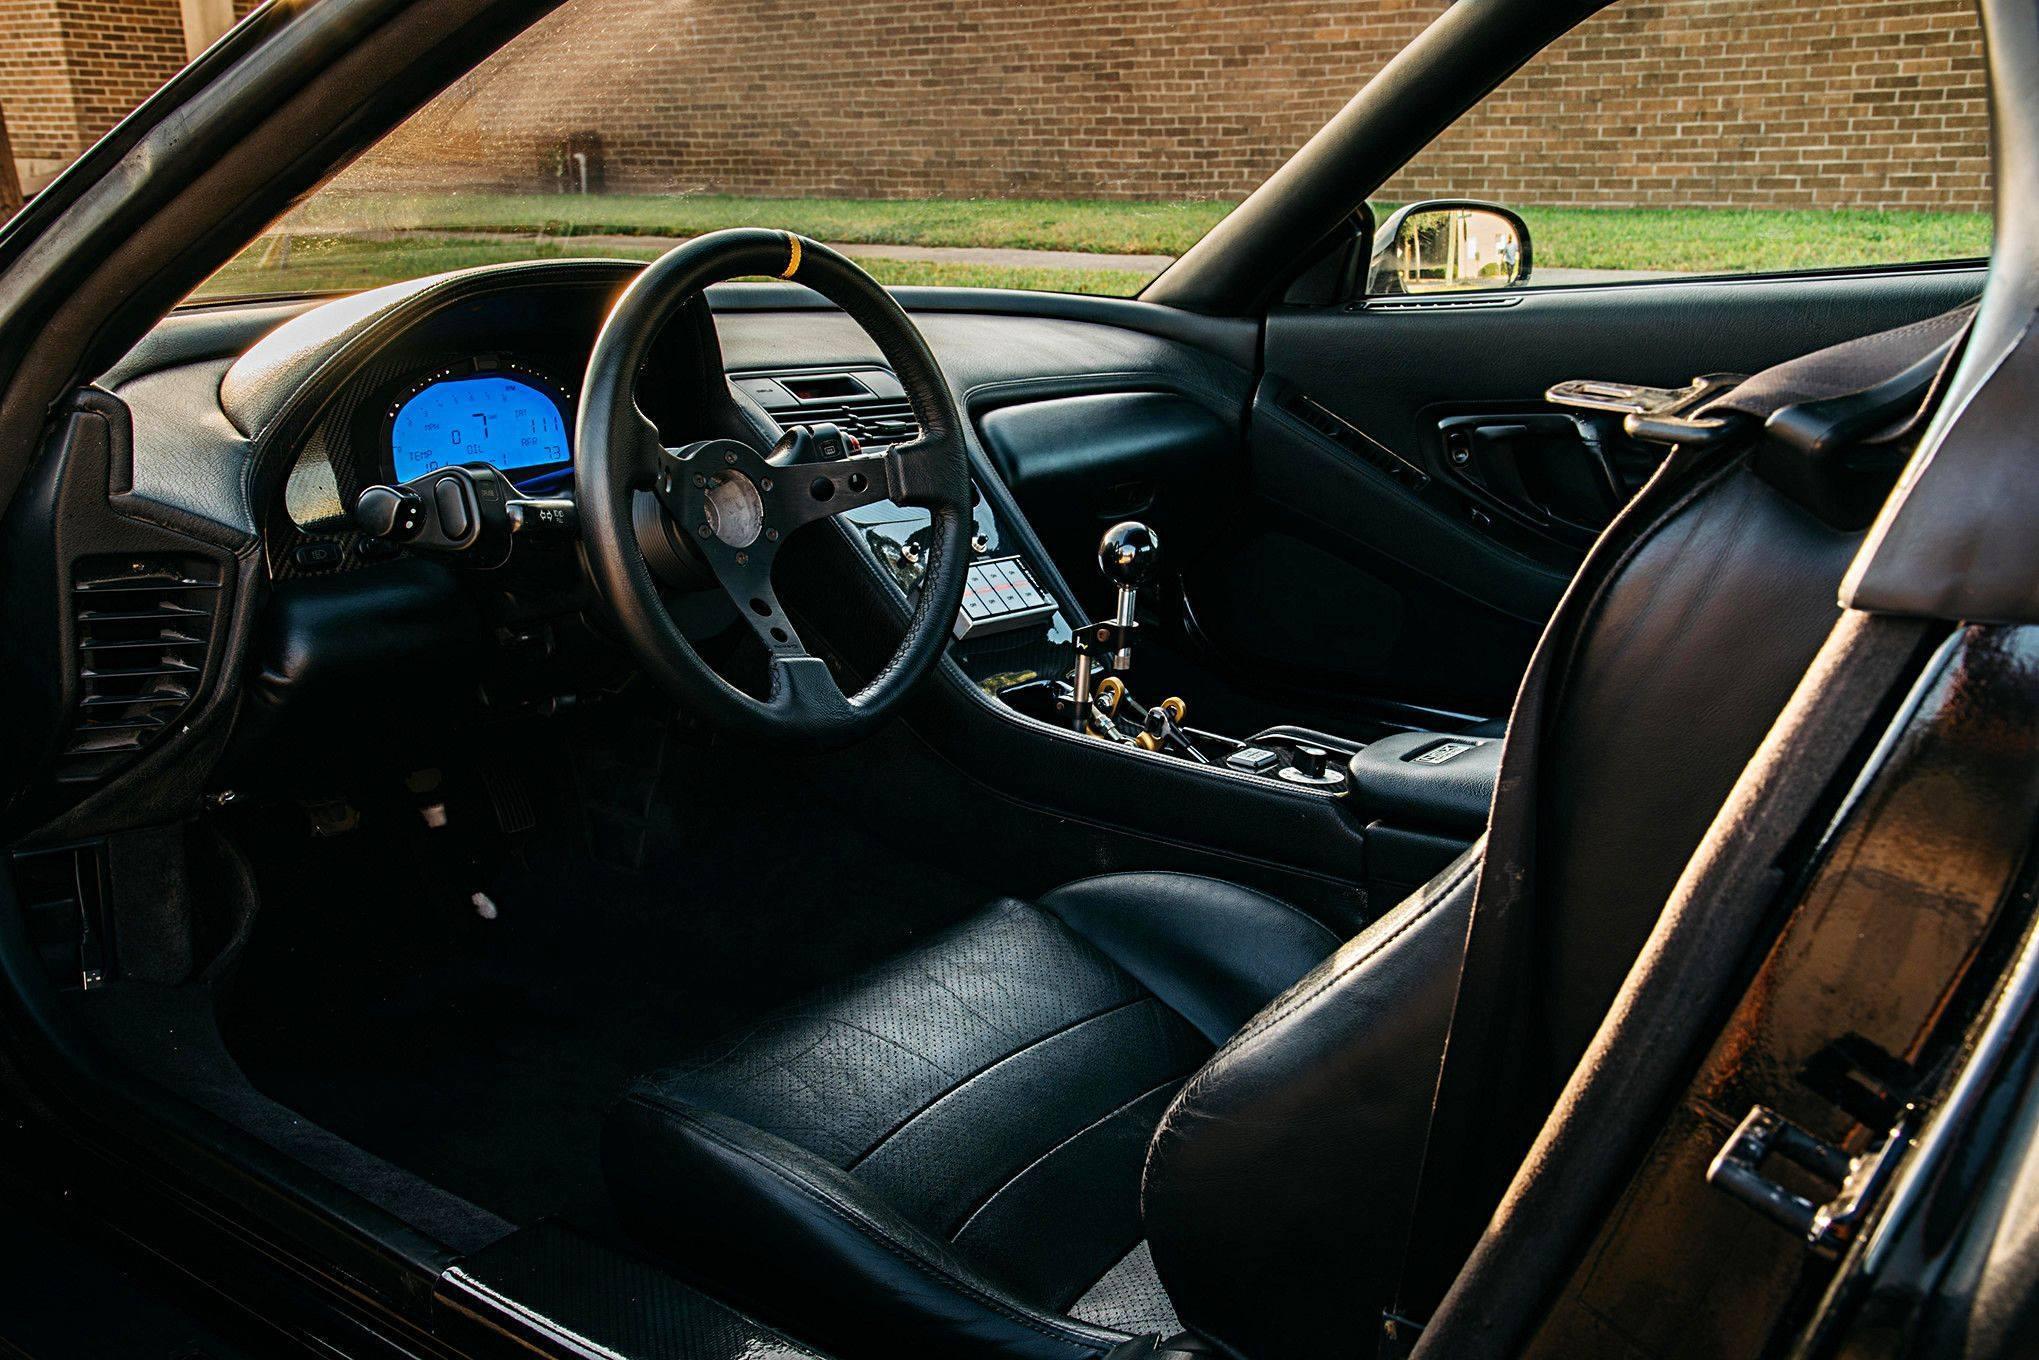 Honda-tech.com Honda Acura turbo K20 swap NSX